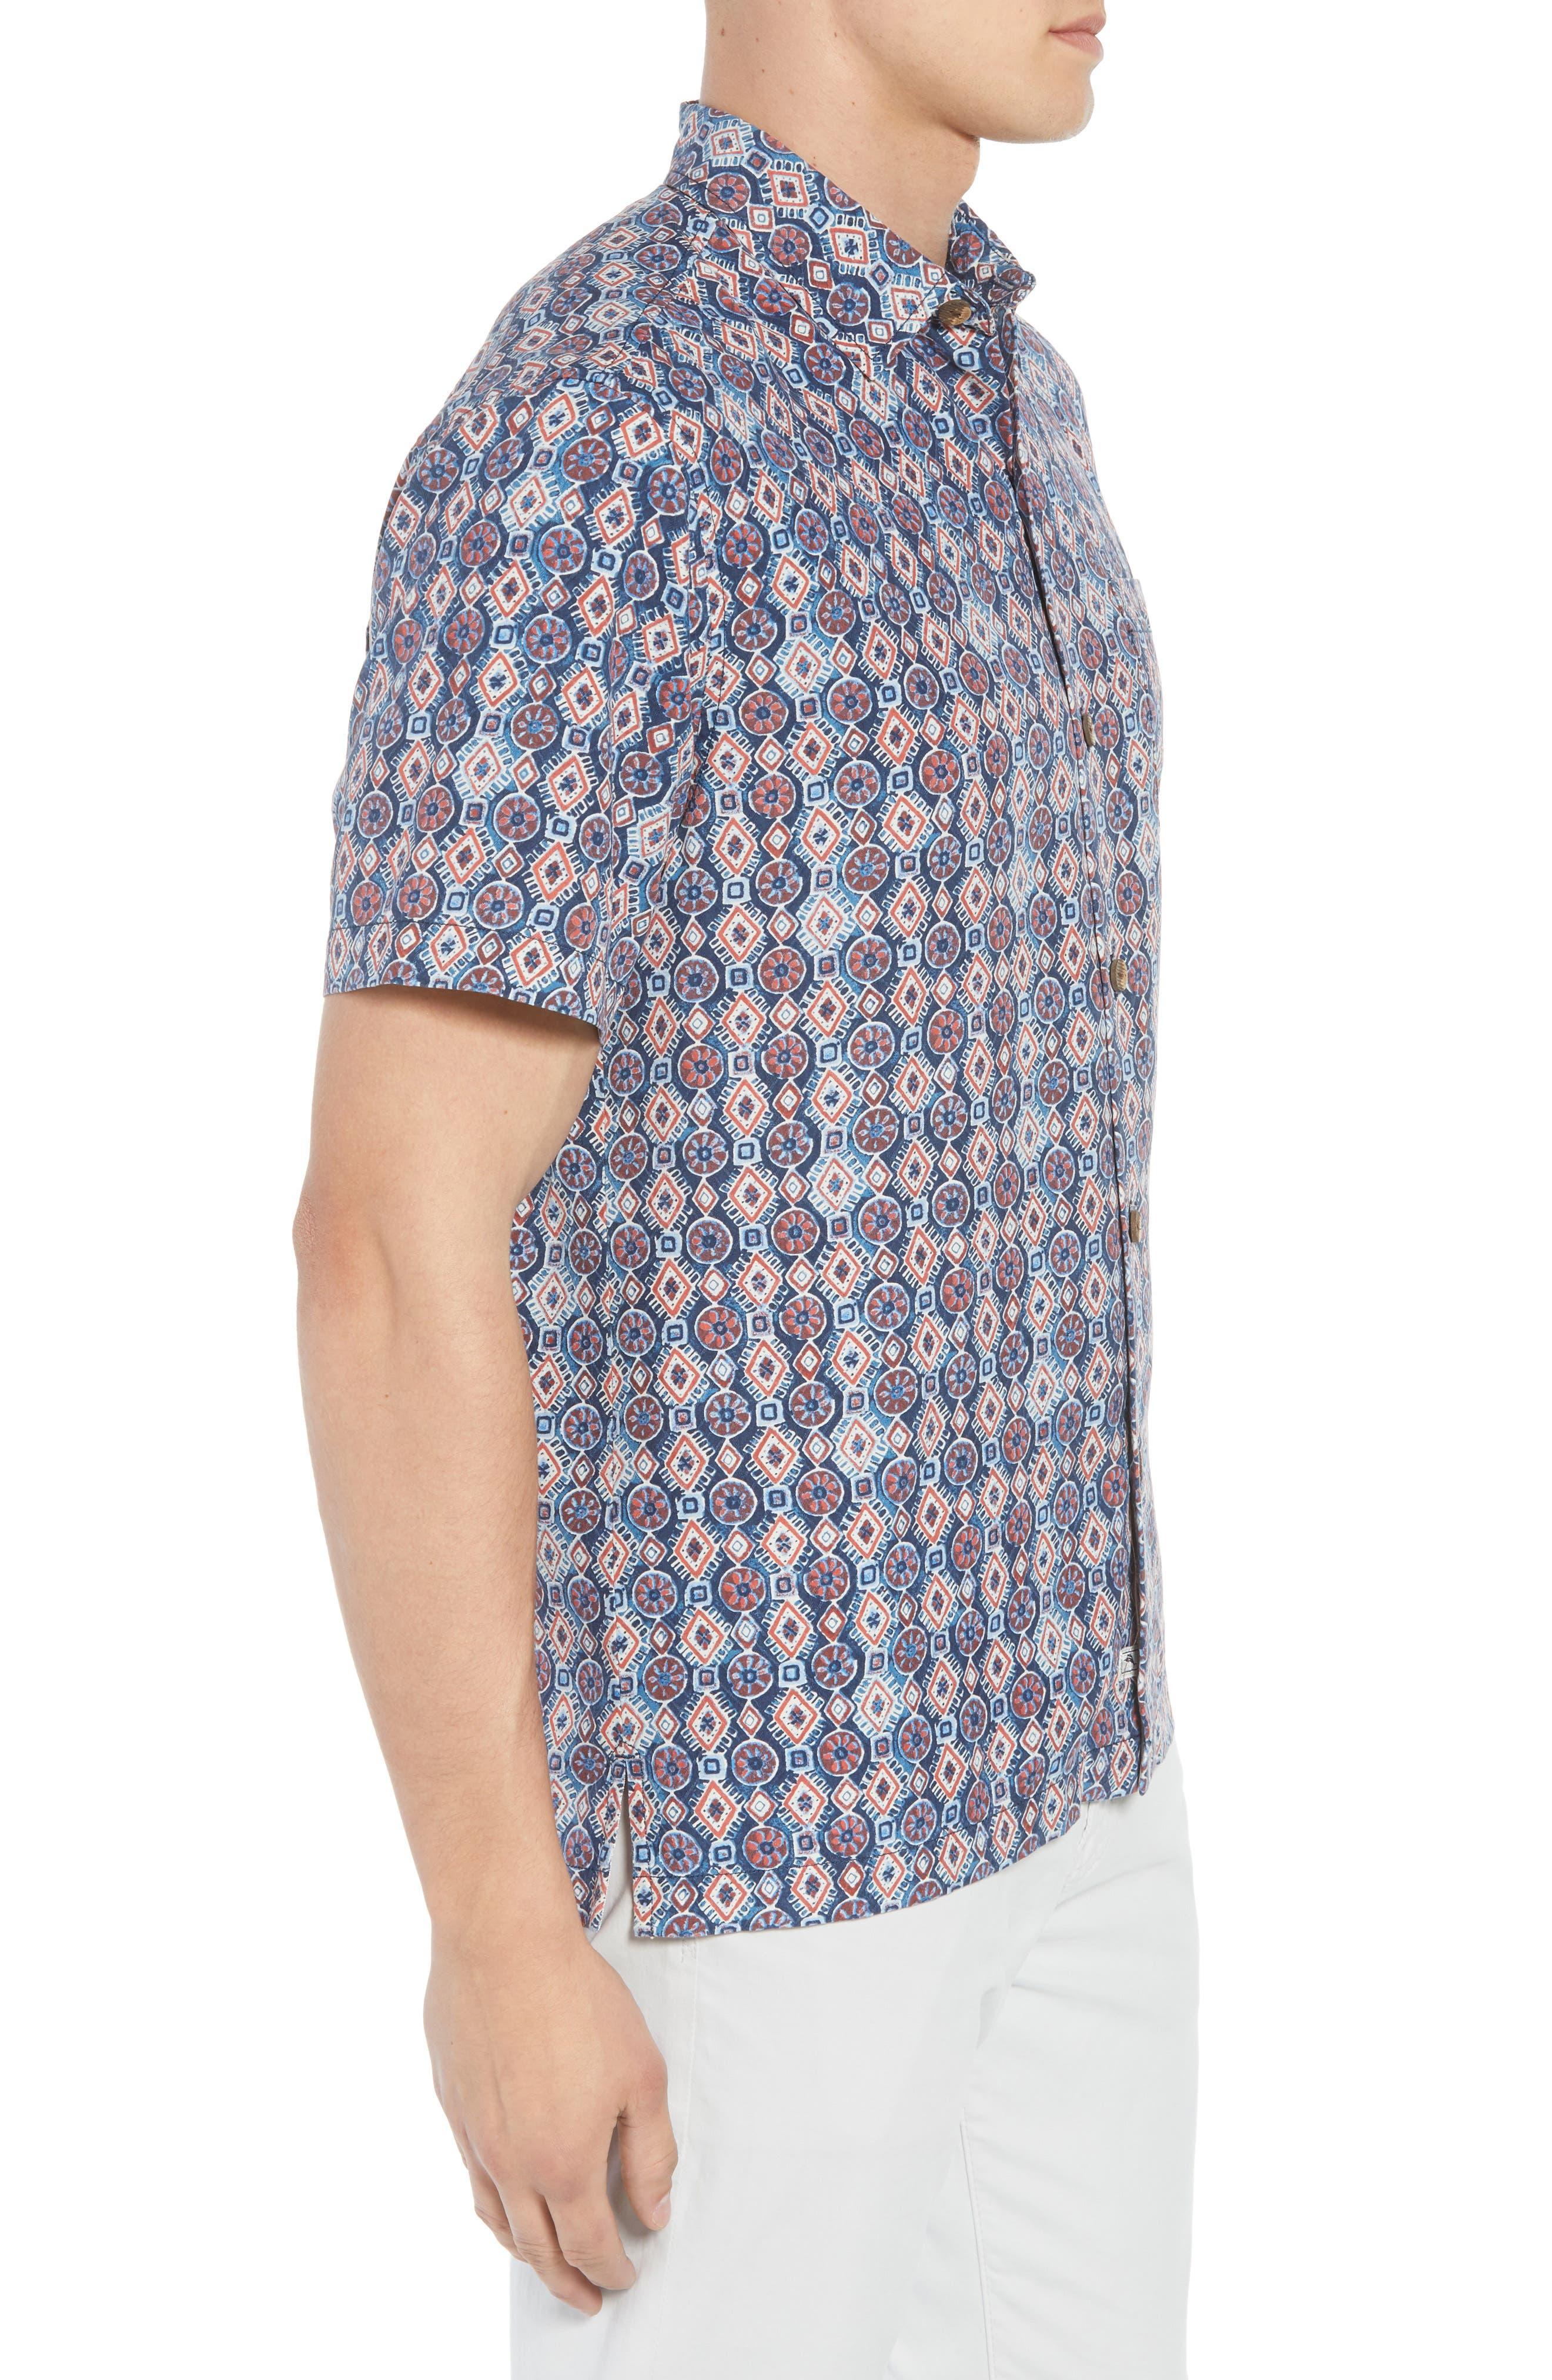 TOMMY BAHAMA,                             Tulum Tiles Silk Camp Shirt,                             Alternate thumbnail 3, color,                             400